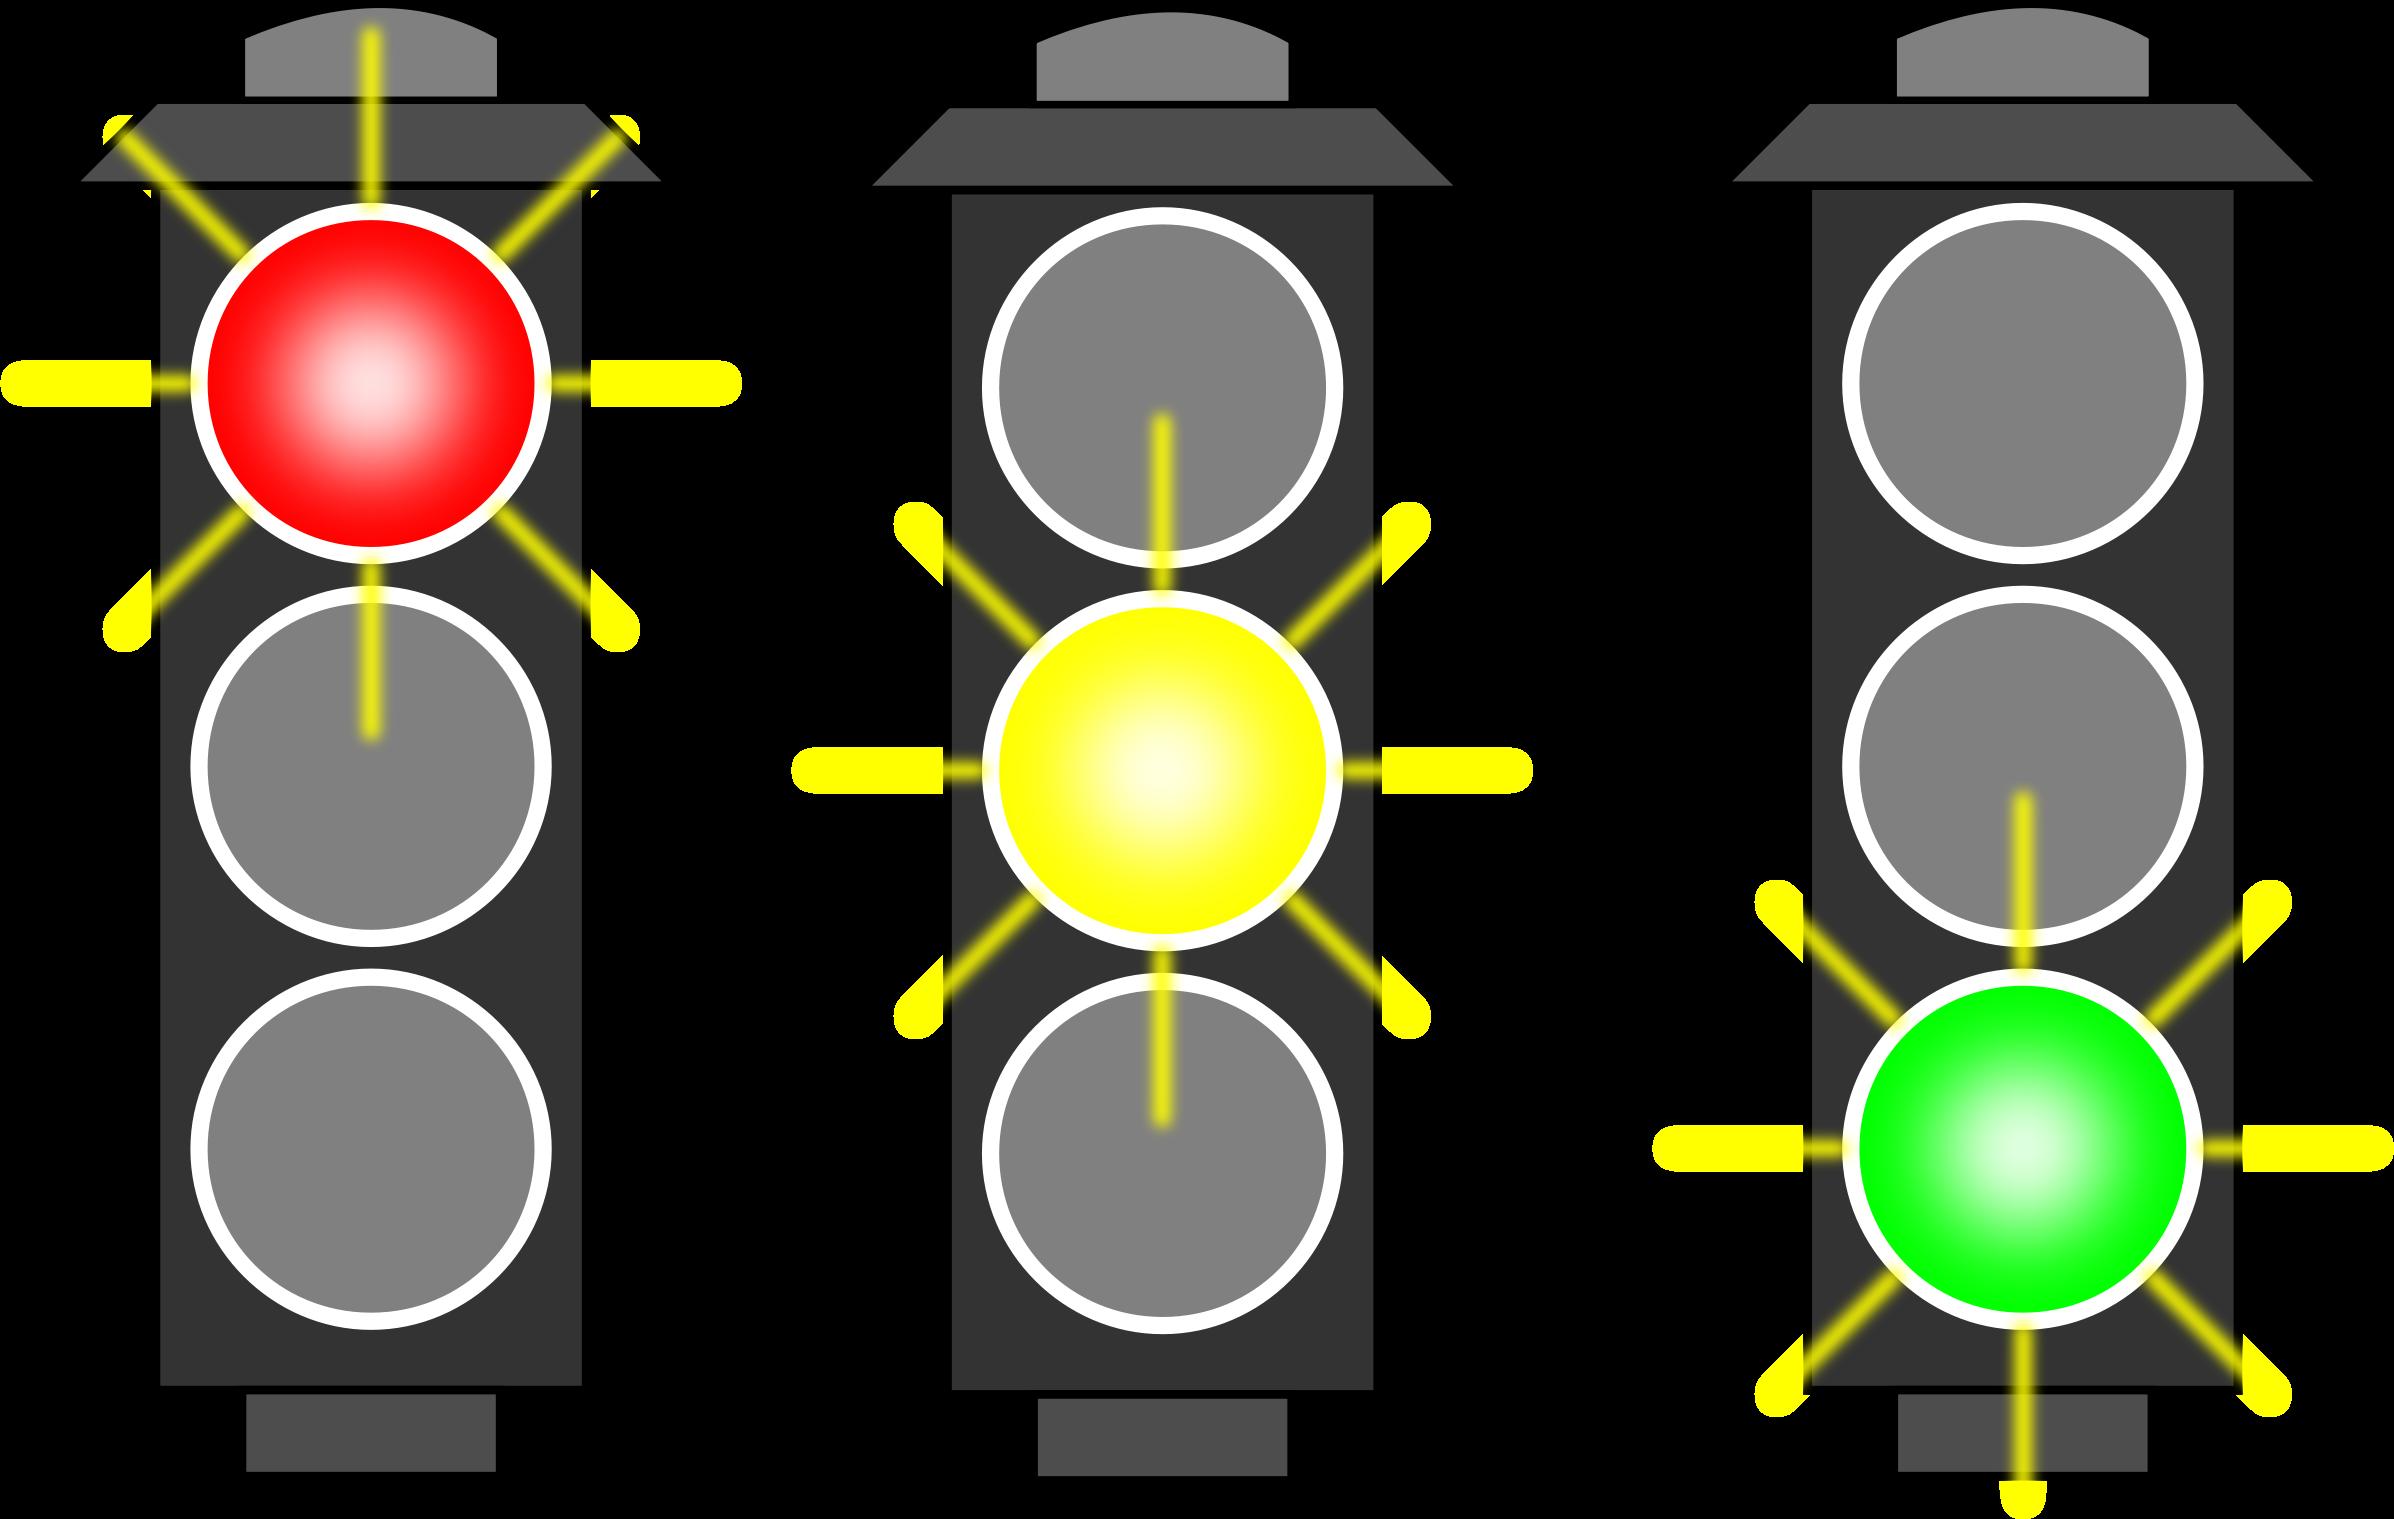 Green traffic light clipart kid-Green traffic light clipart kid-7